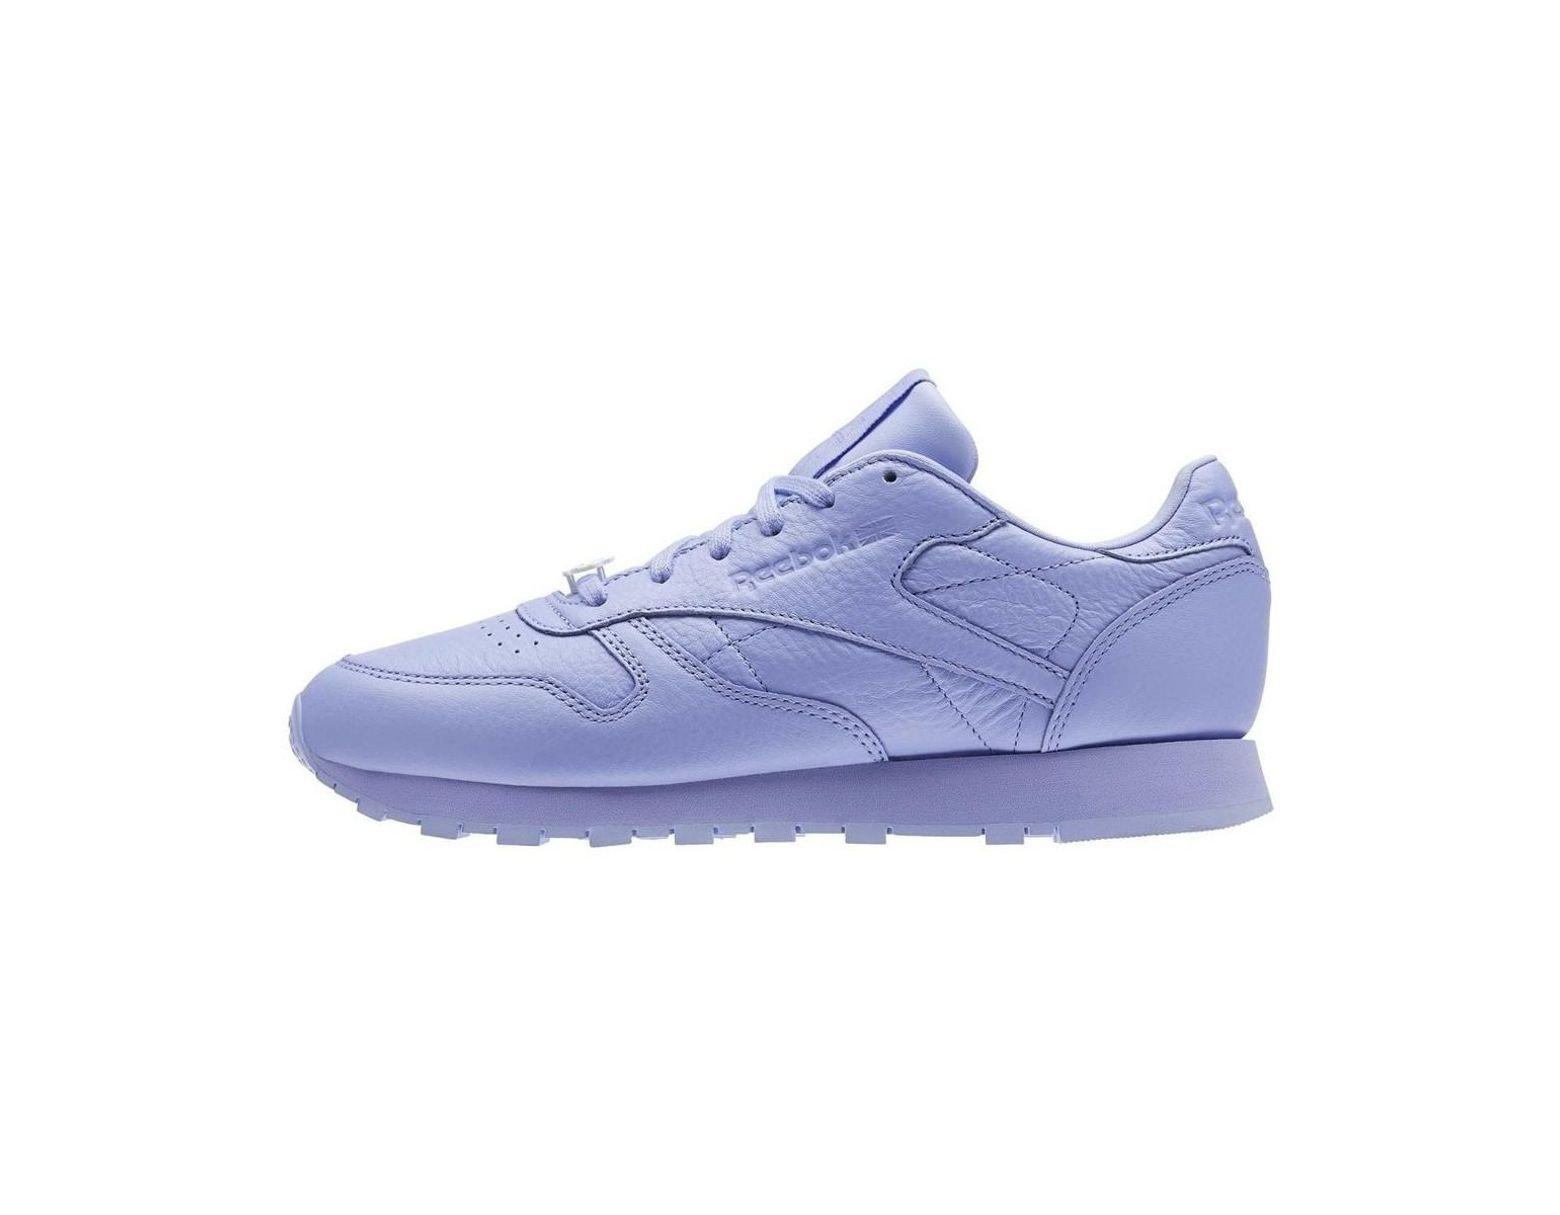 Glow En Femmes Reebok Lilac Leather Classic Violet Chaussures 5qjL4AR3